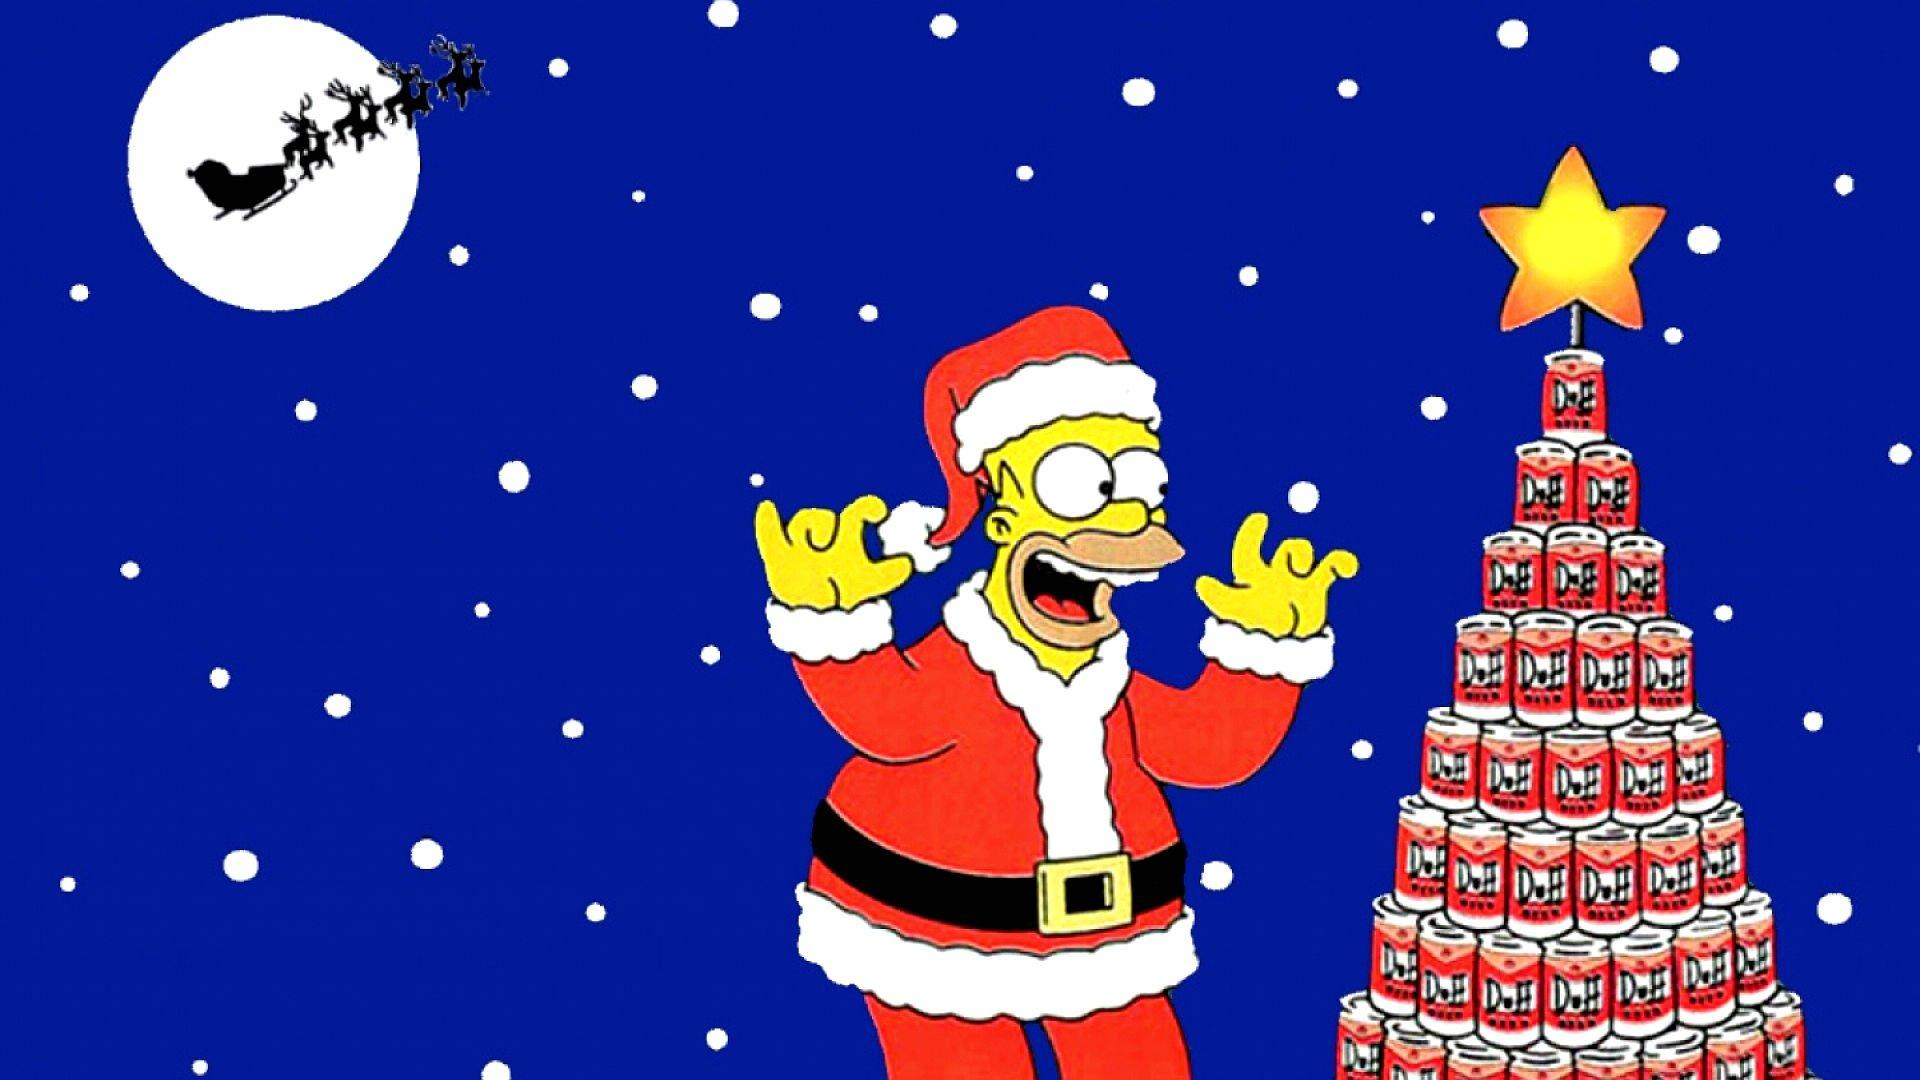 Imagenes De Navidad Simpsons 2294388 Hd Wallpaper